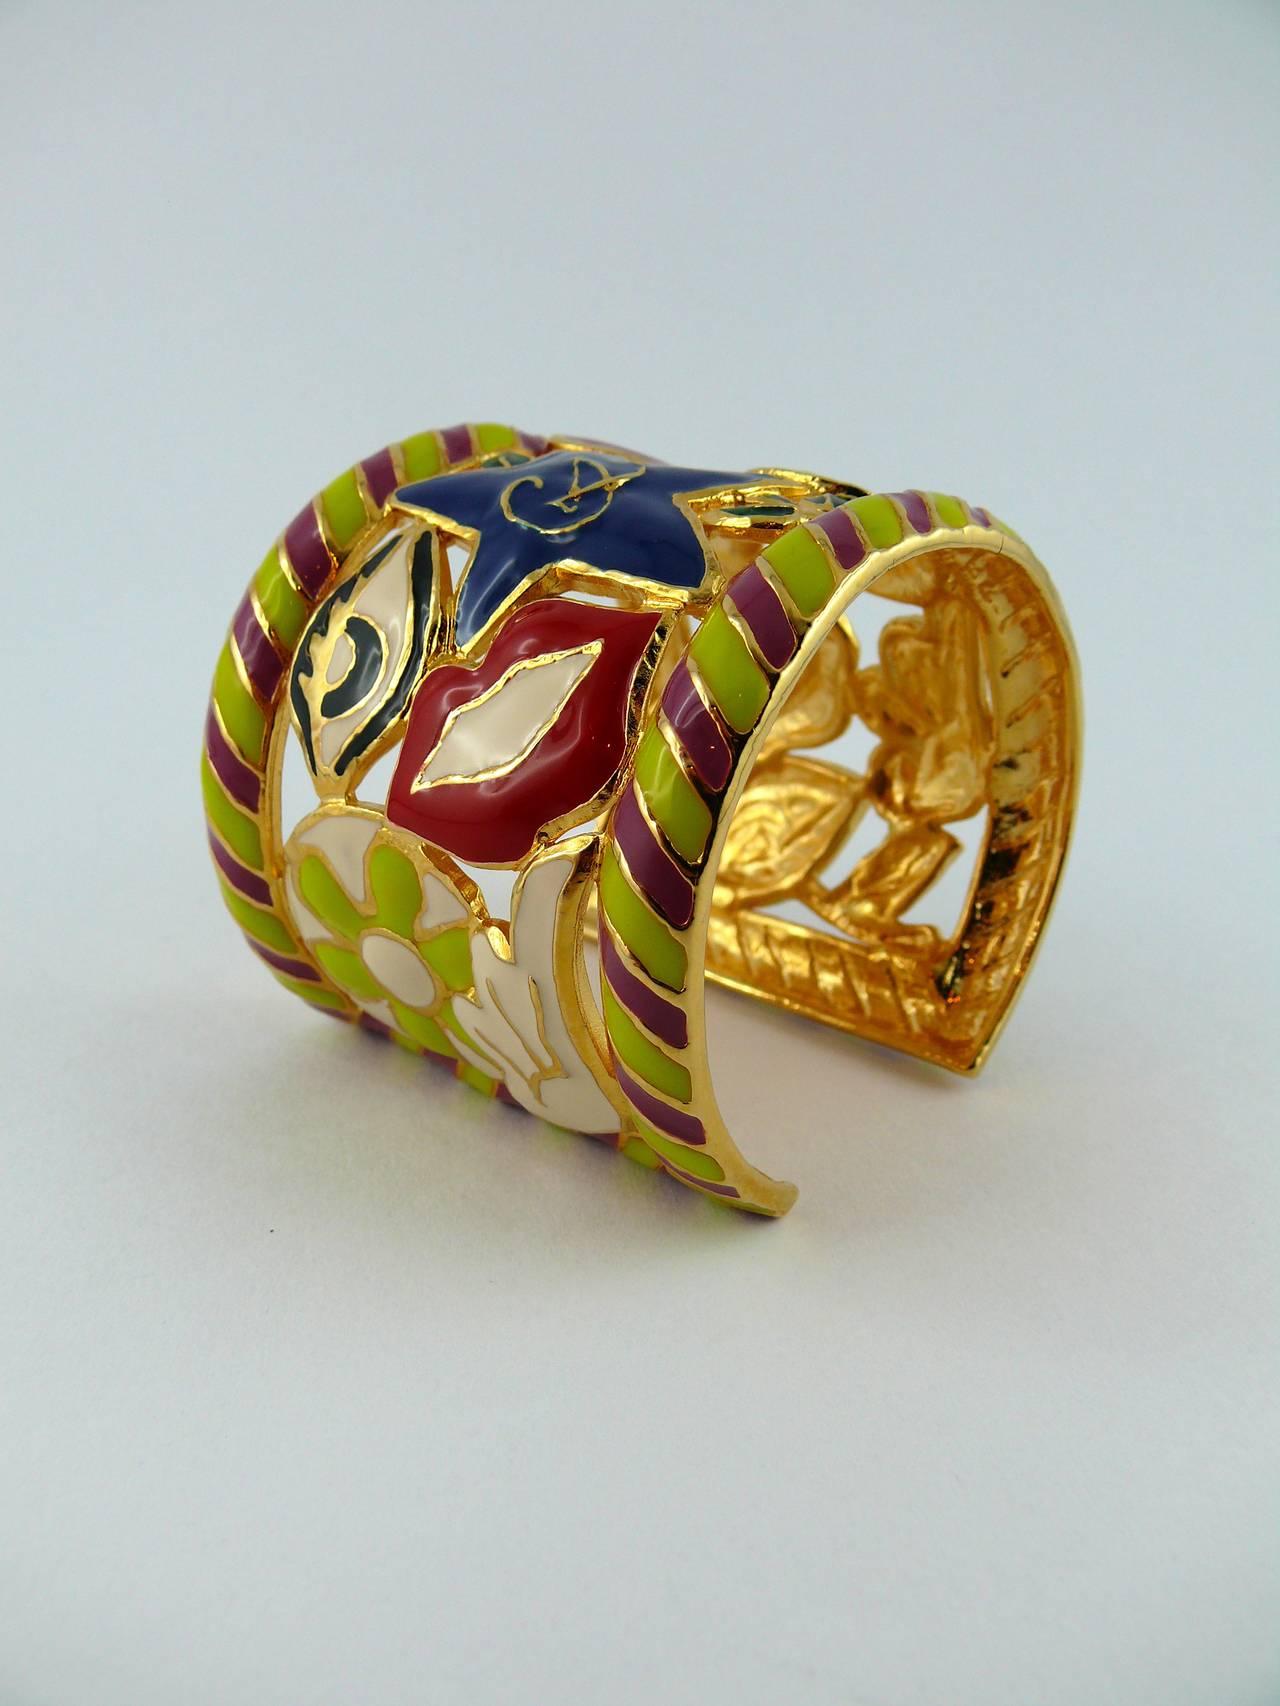 christian lacroix vintage rare surrealist enamel cuff bracelet at 1stdibs. Black Bedroom Furniture Sets. Home Design Ideas